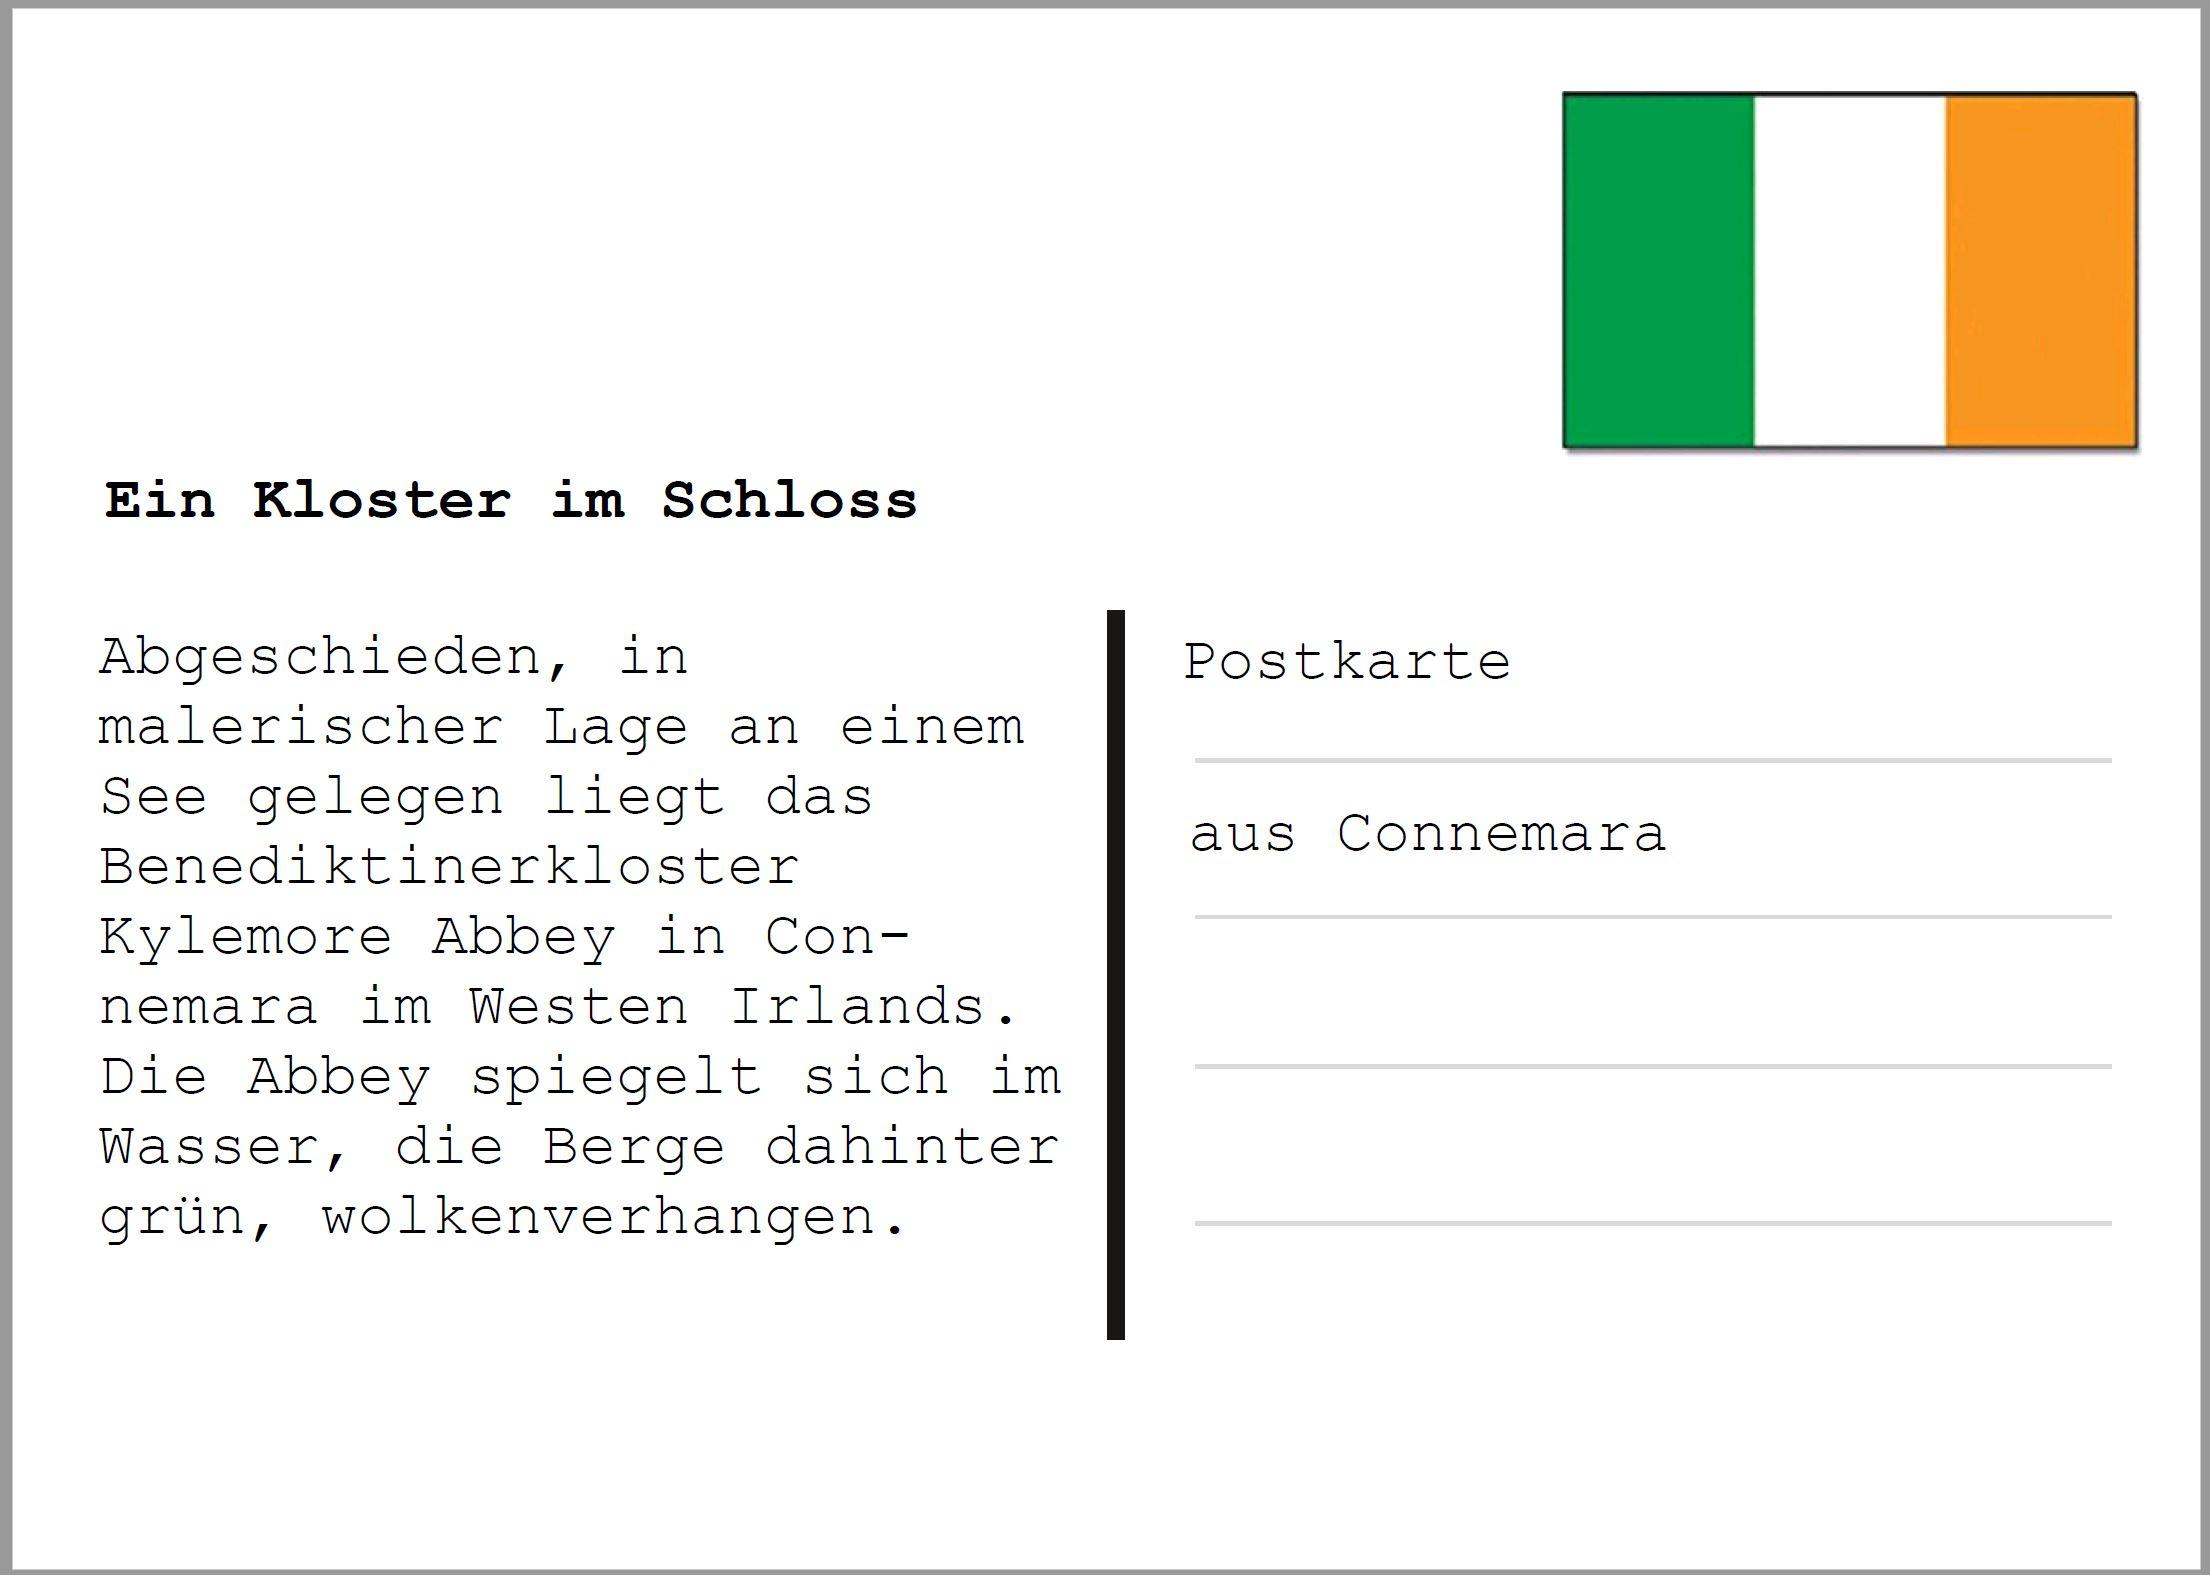 Großzügig Moo Postkarte Vorlage Fotos - Entry Level Resume Vorlagen ...